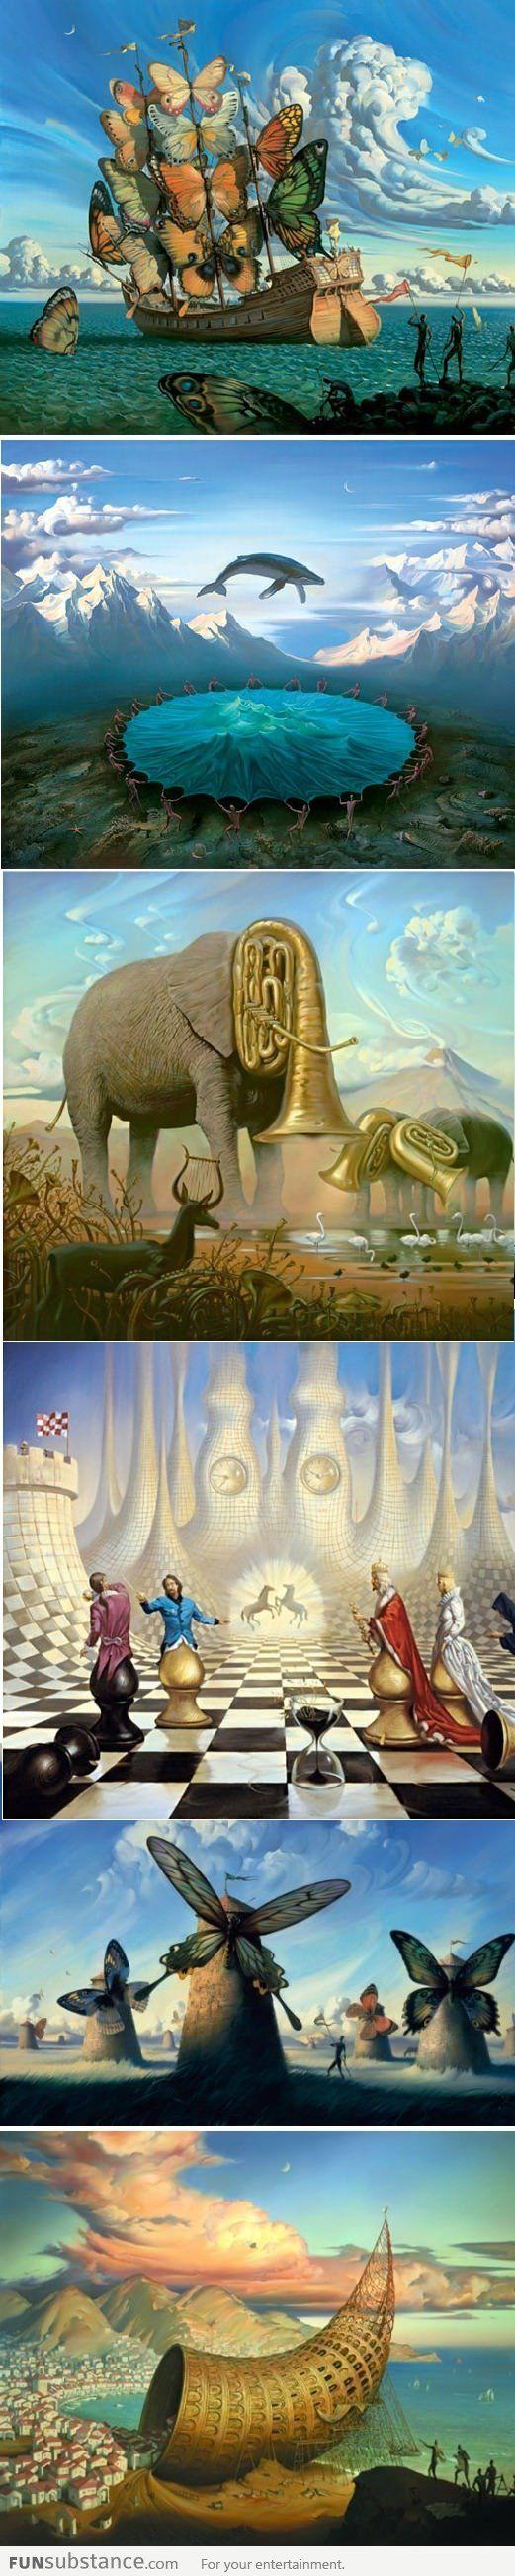 Surrealistic painter: Vladimir Kush - FunSubstance.com